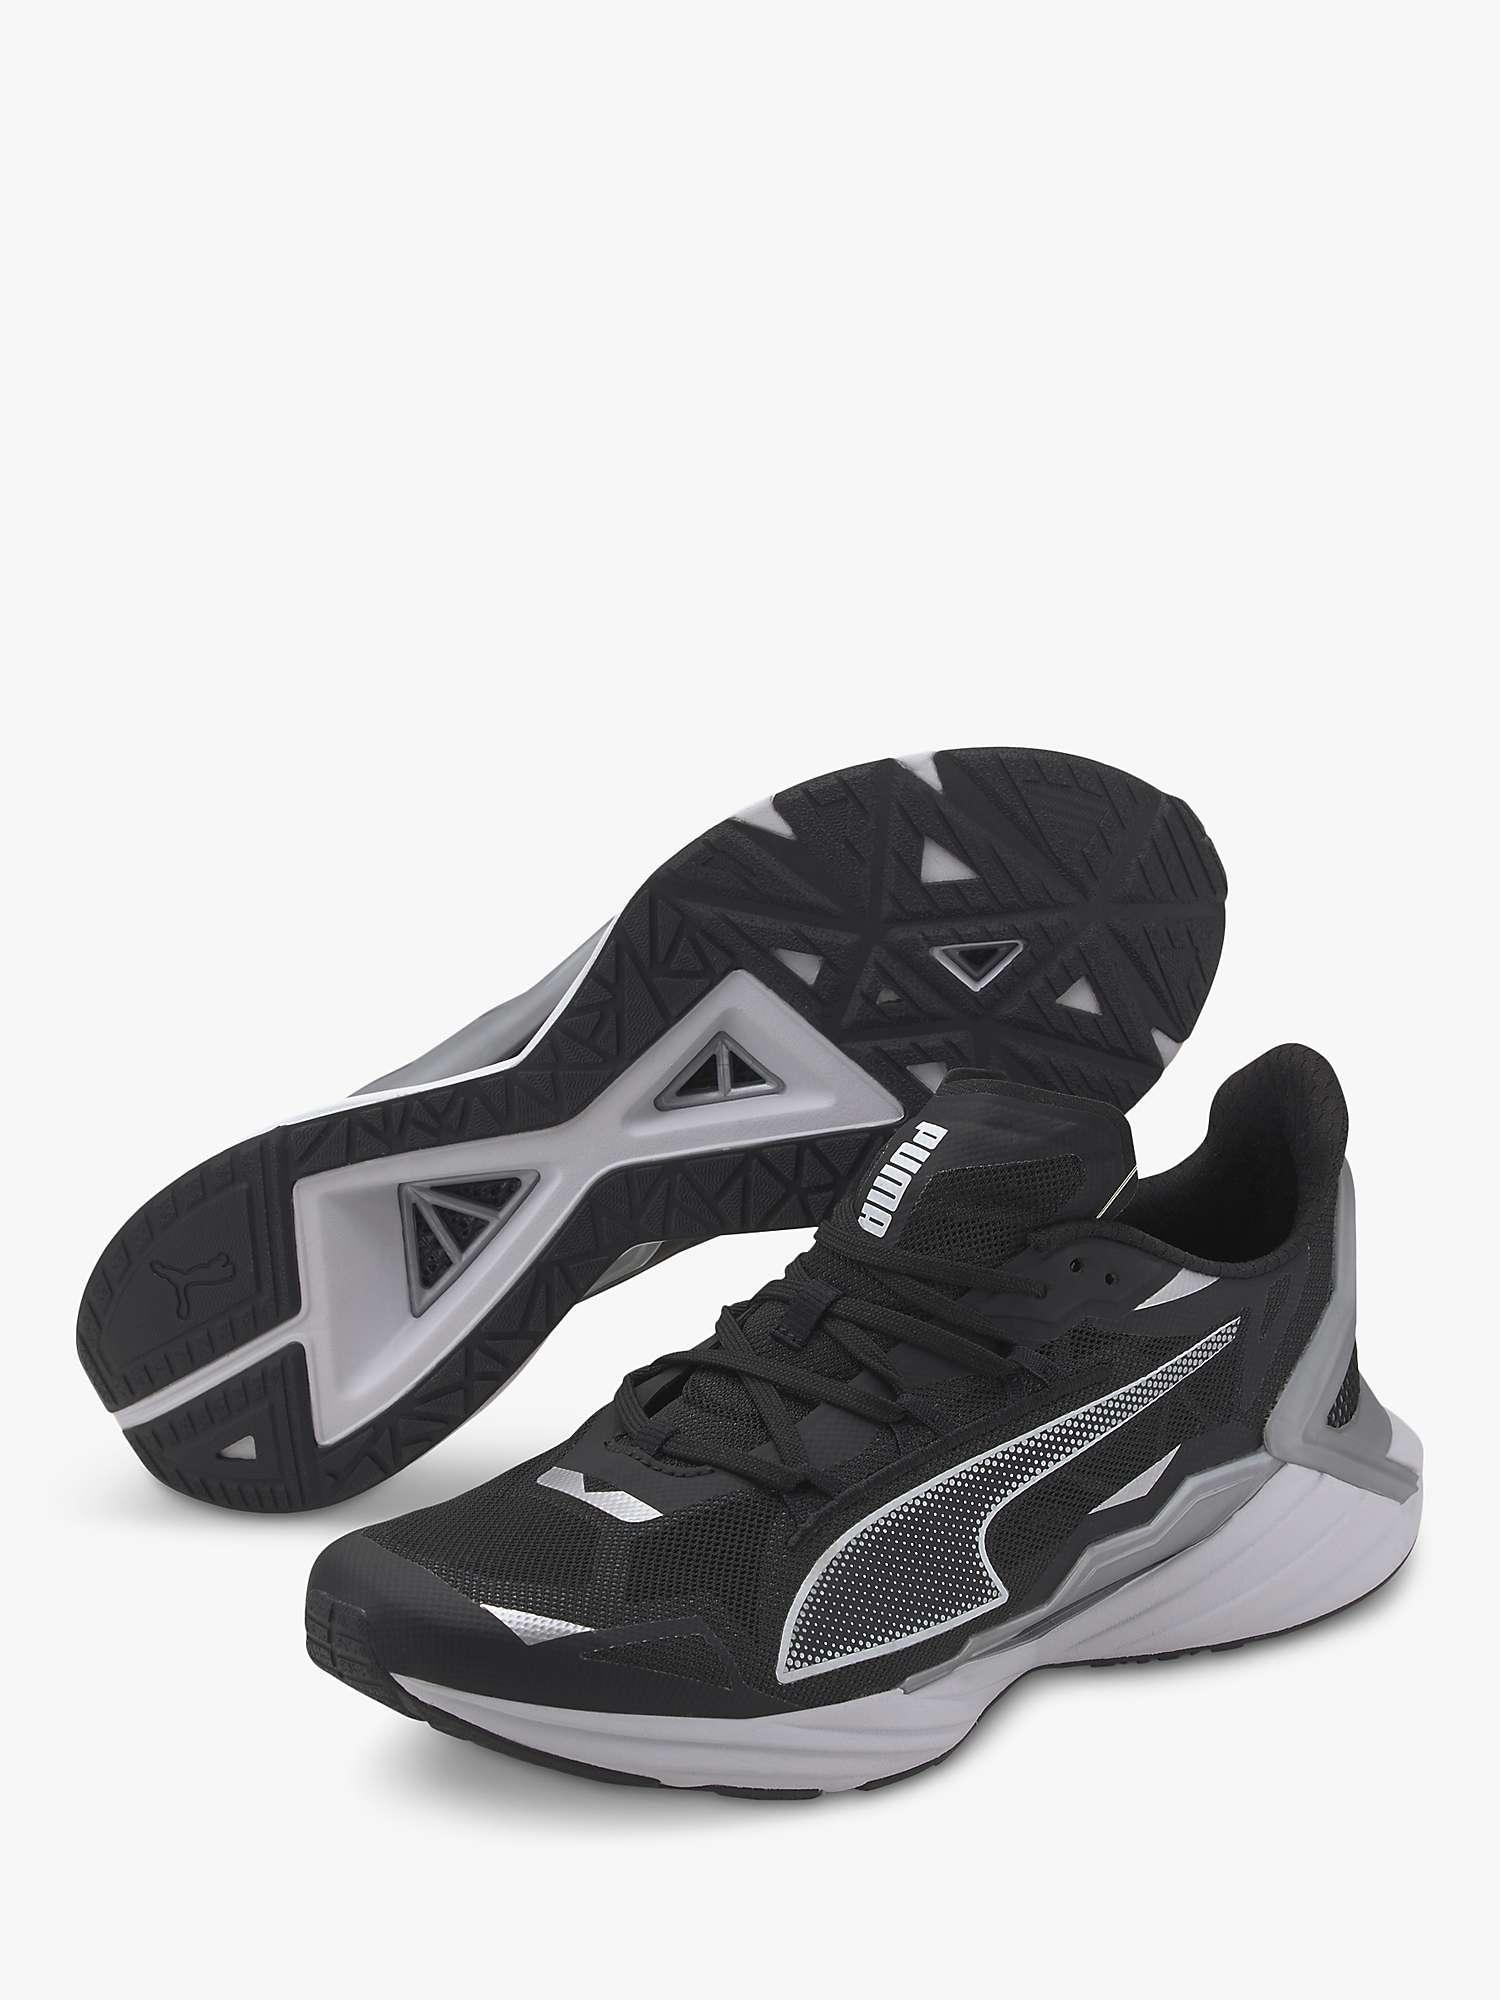 Asesorar Mariscos botella  PUMA UltraRide Men's Running Shoes, PUMA Black/PUMA Silver at John Lewis &  Partners